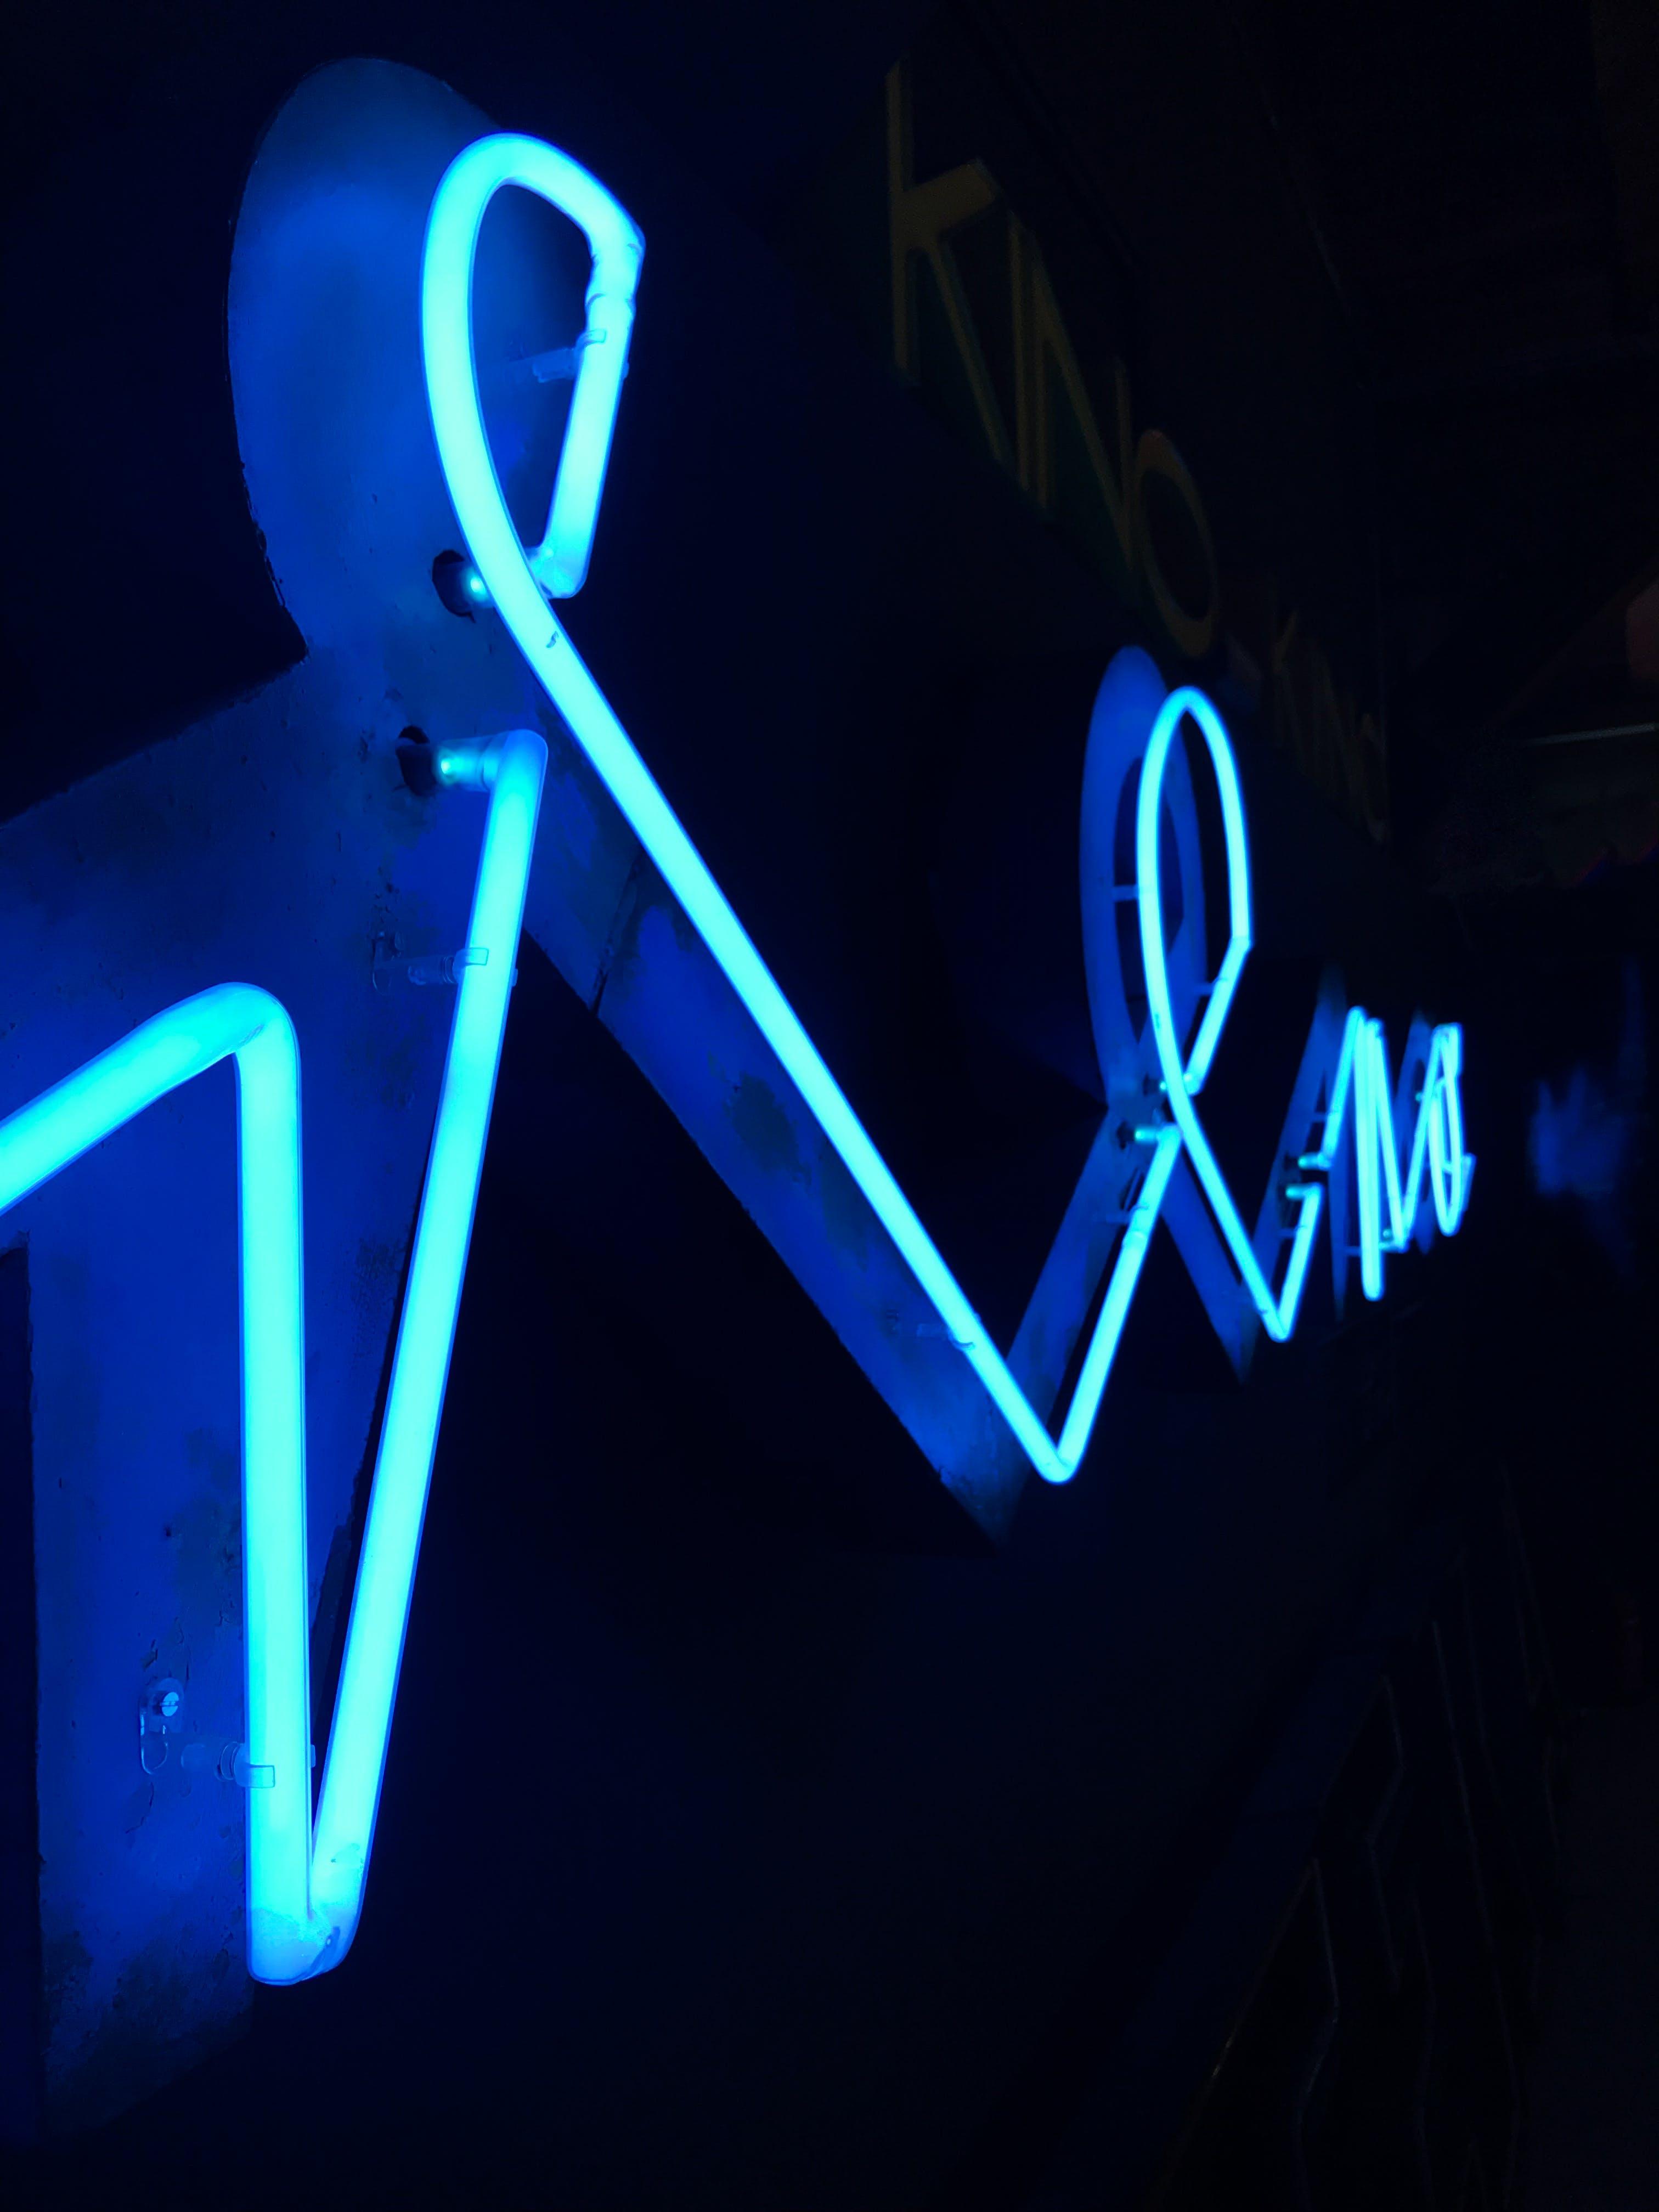 Free stock photo of blue, neon, neon lights, Neon muzeum